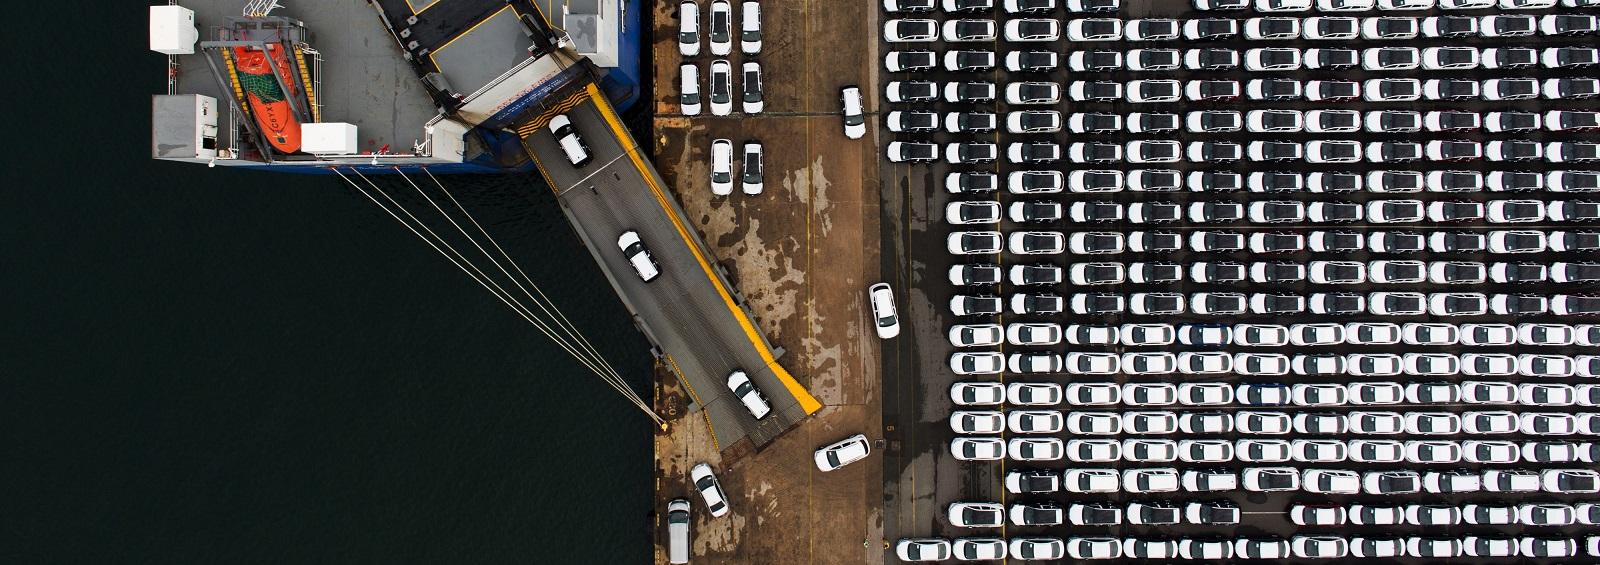 Hyundai Motor vehicles are driven into a cargo ship at a port in Ulsan, South Korea. (Photo: SeongJoon Cho/Getty Images)